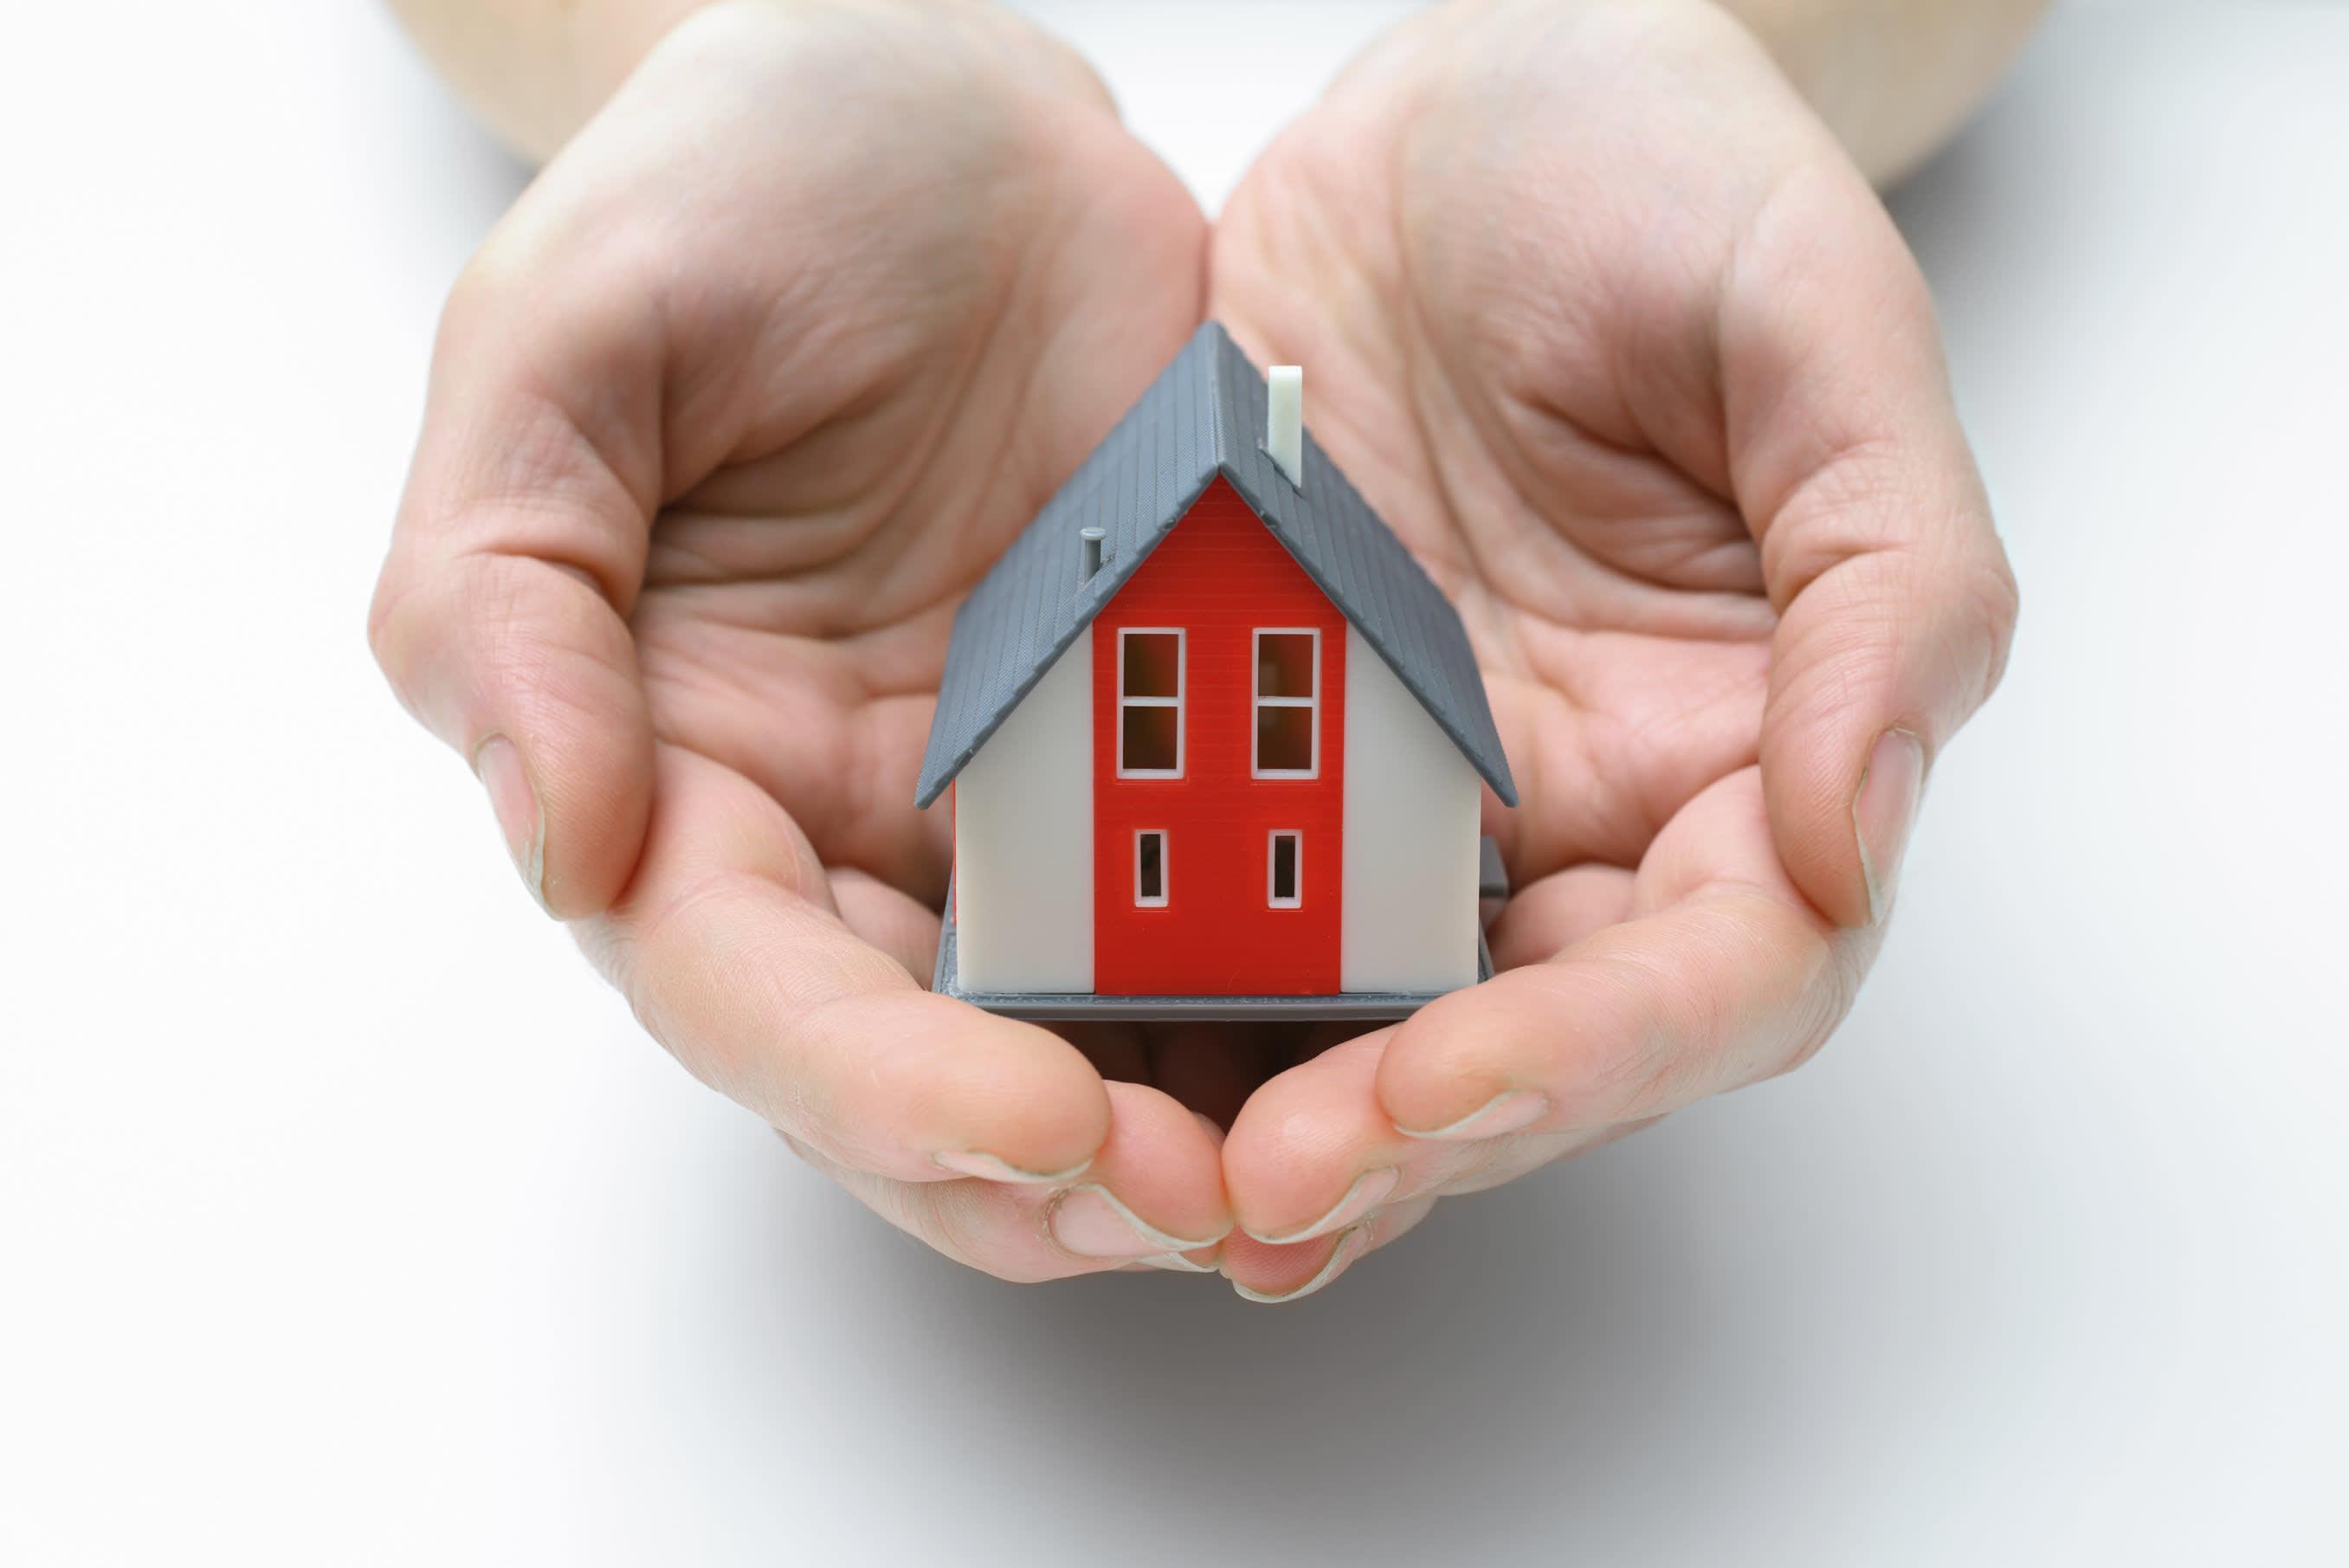 Should we abolish household debts? By Johnna Montgomerie